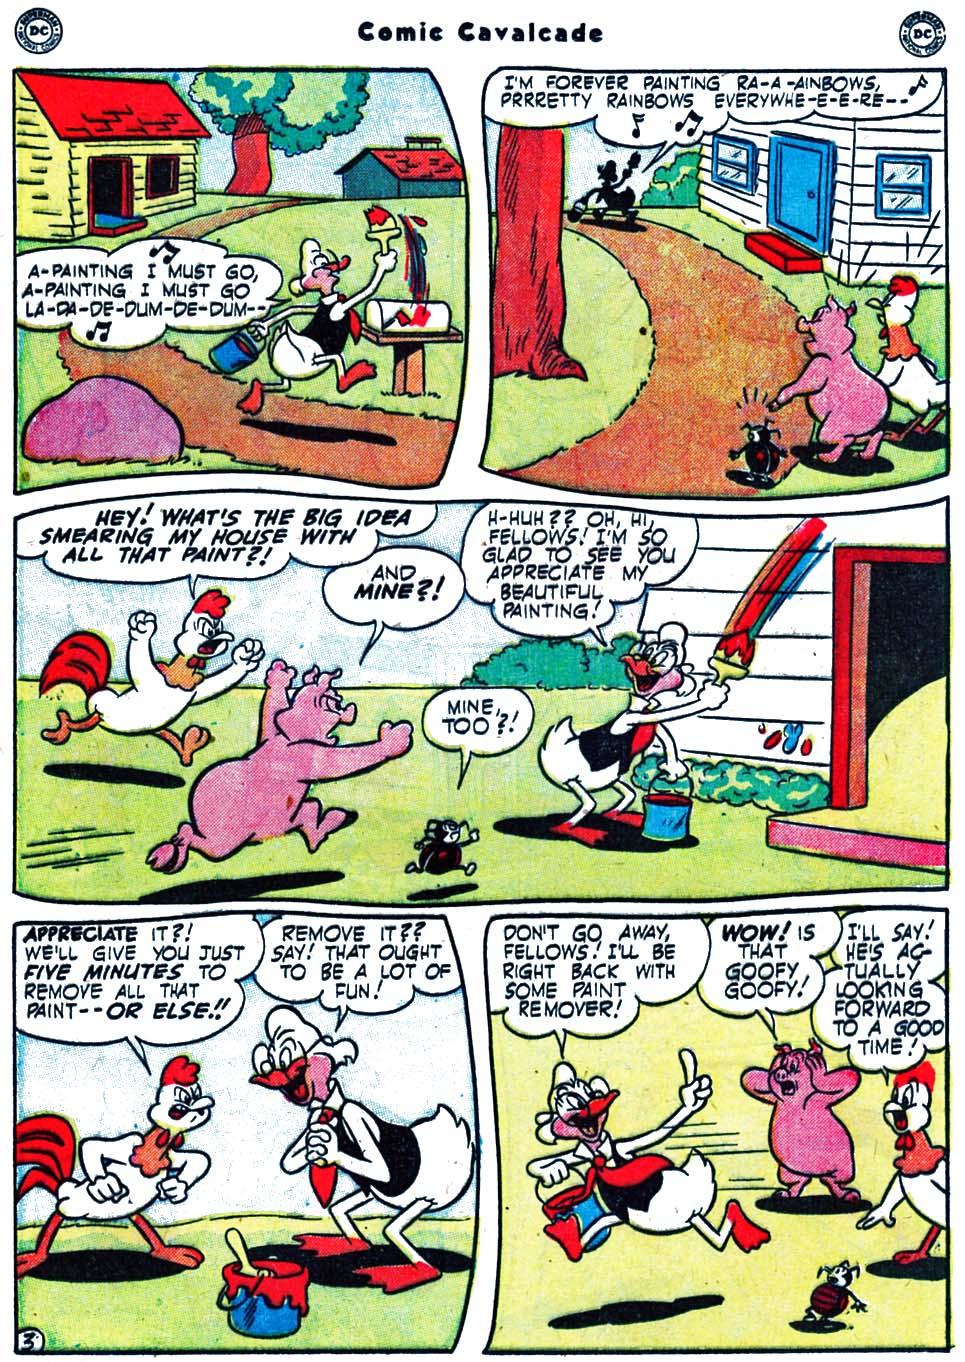 Comic Cavalcade issue 39 - Page 61